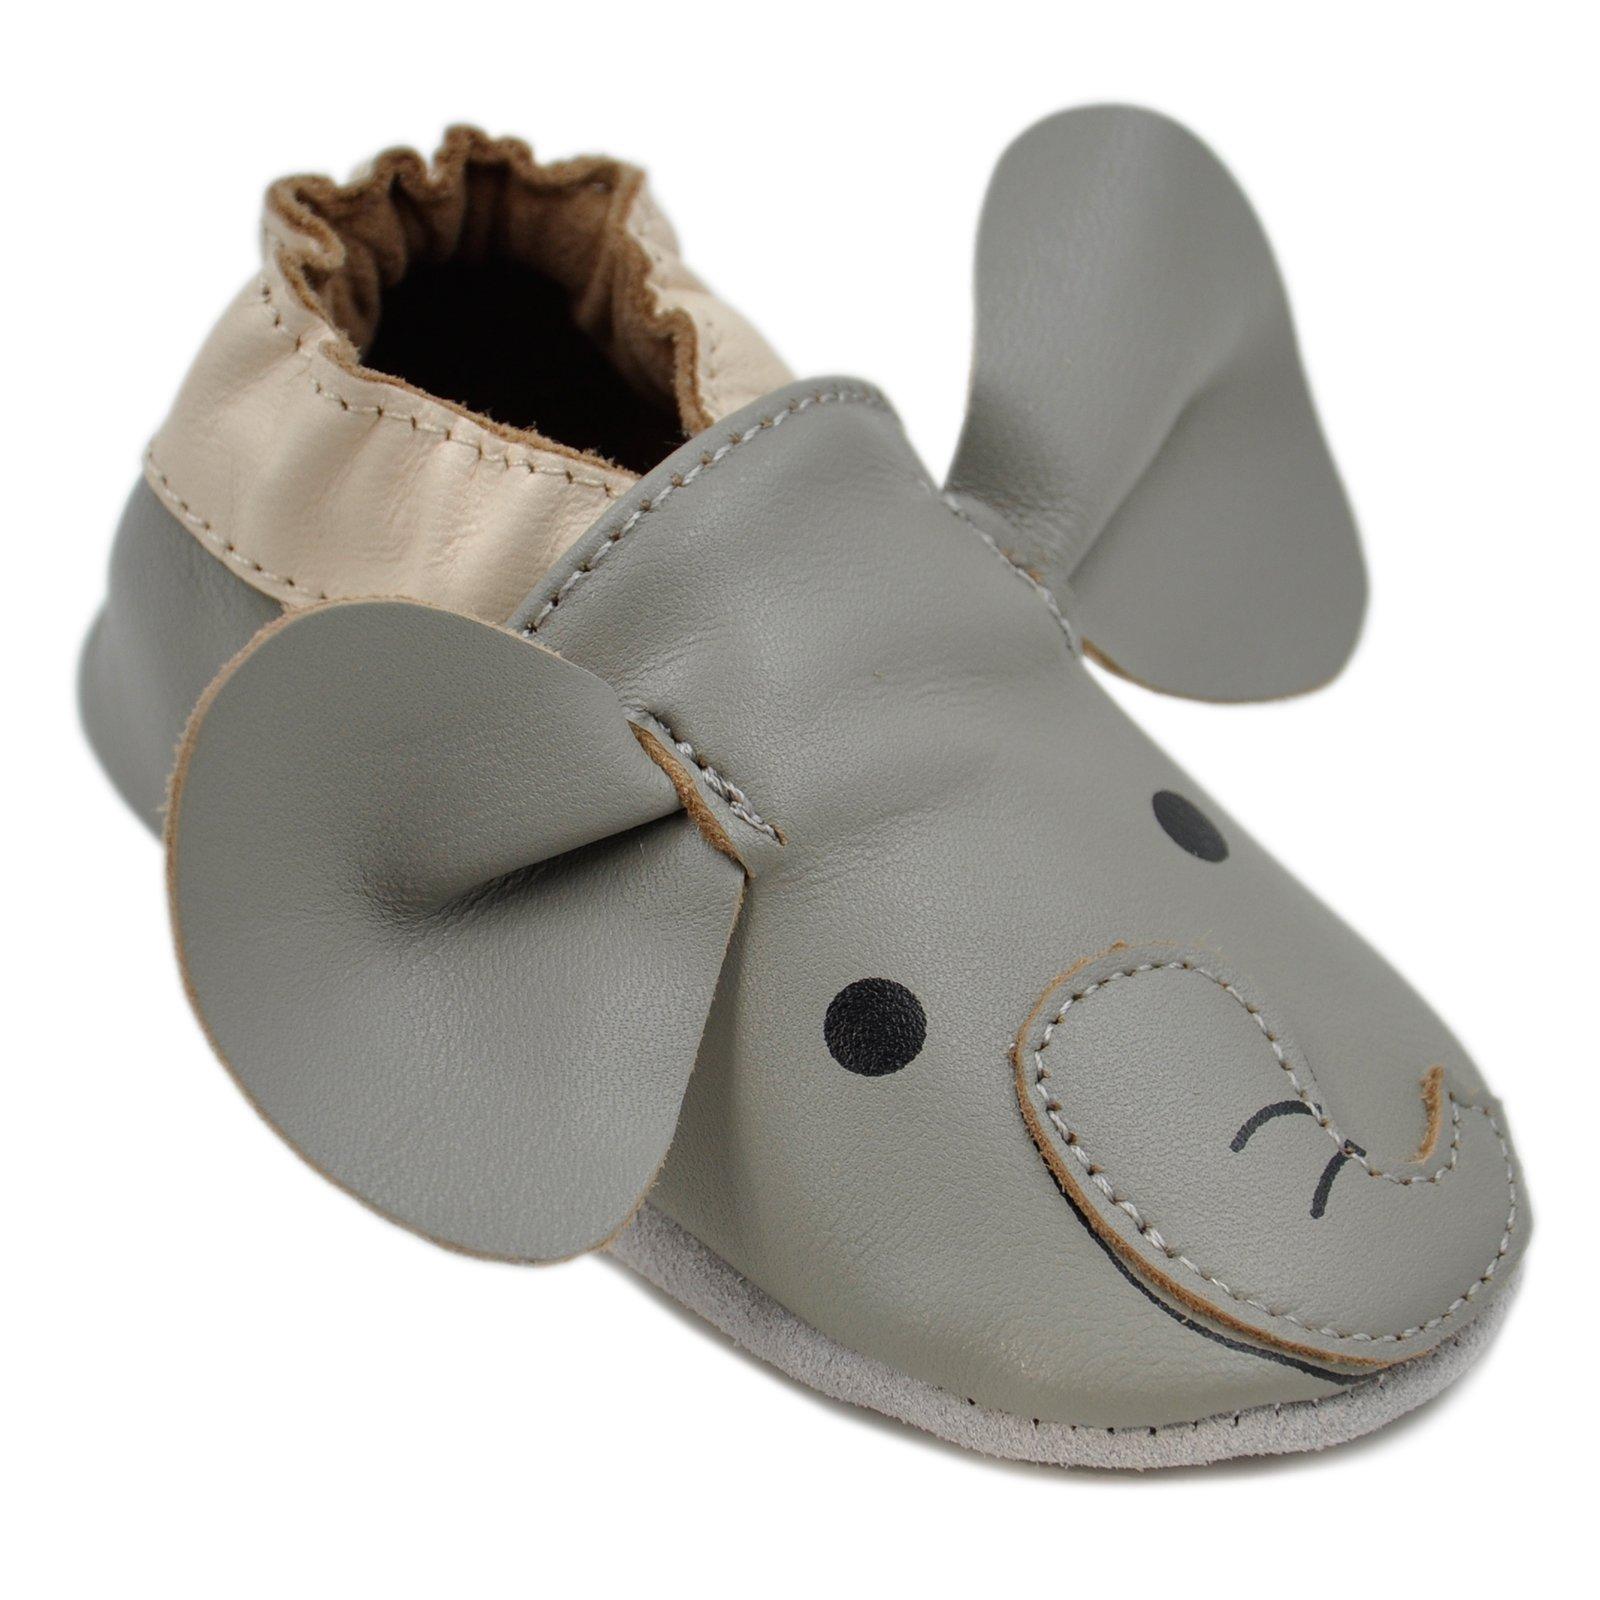 Kimi + Kai Baby Unisex Lambskin Leather Soft Sole Shoes - Elephant (6-12 Months) Grey by Kimi & Kai